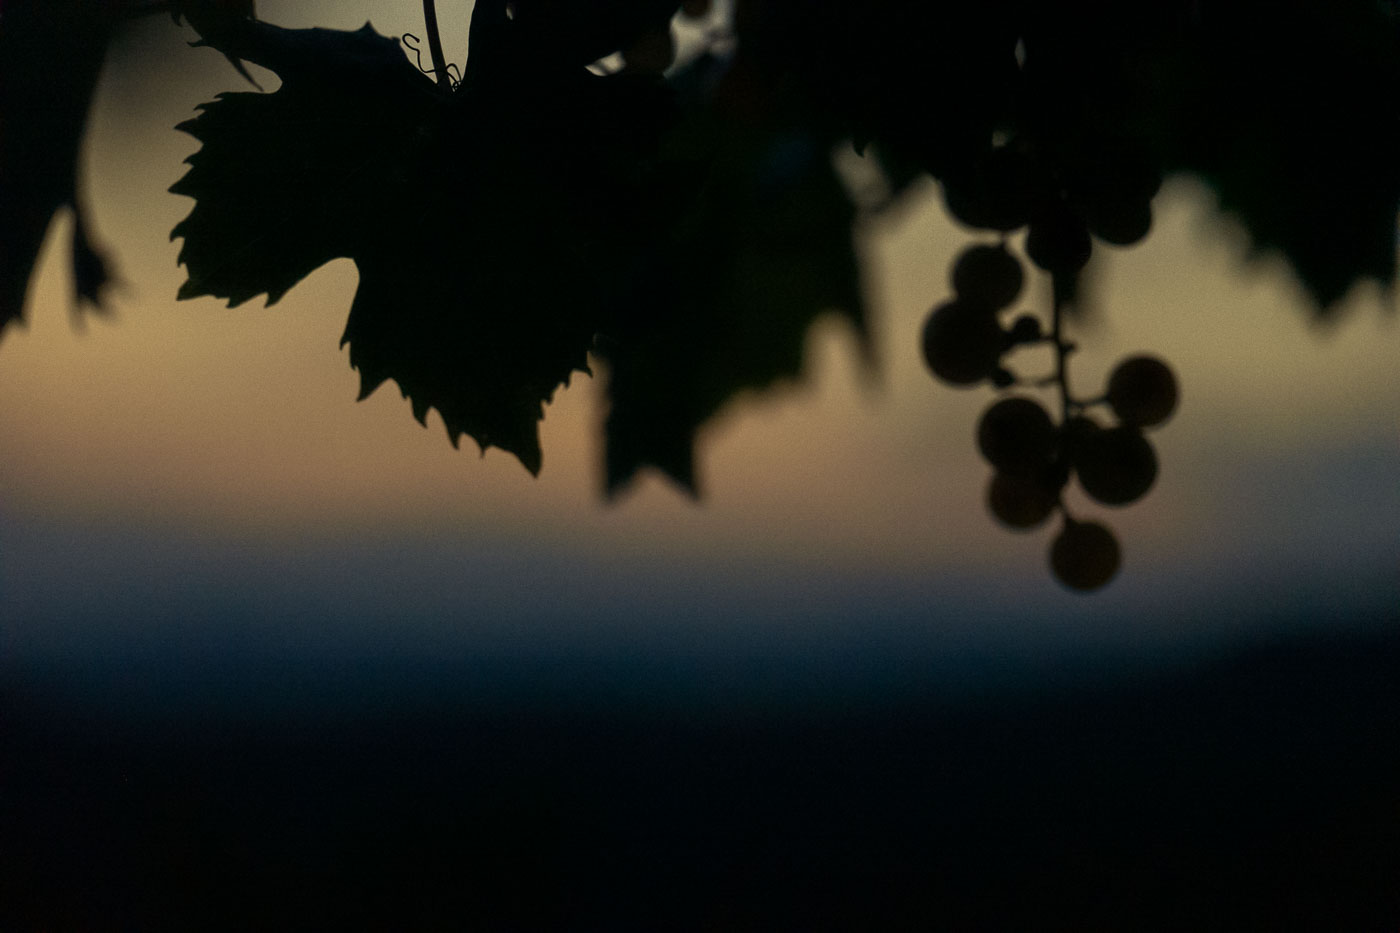 vendemmia-naturale-vino-uva-gambellara-garganega-maule-sauro-fotografo-rui-L1390208_p_Lr_web